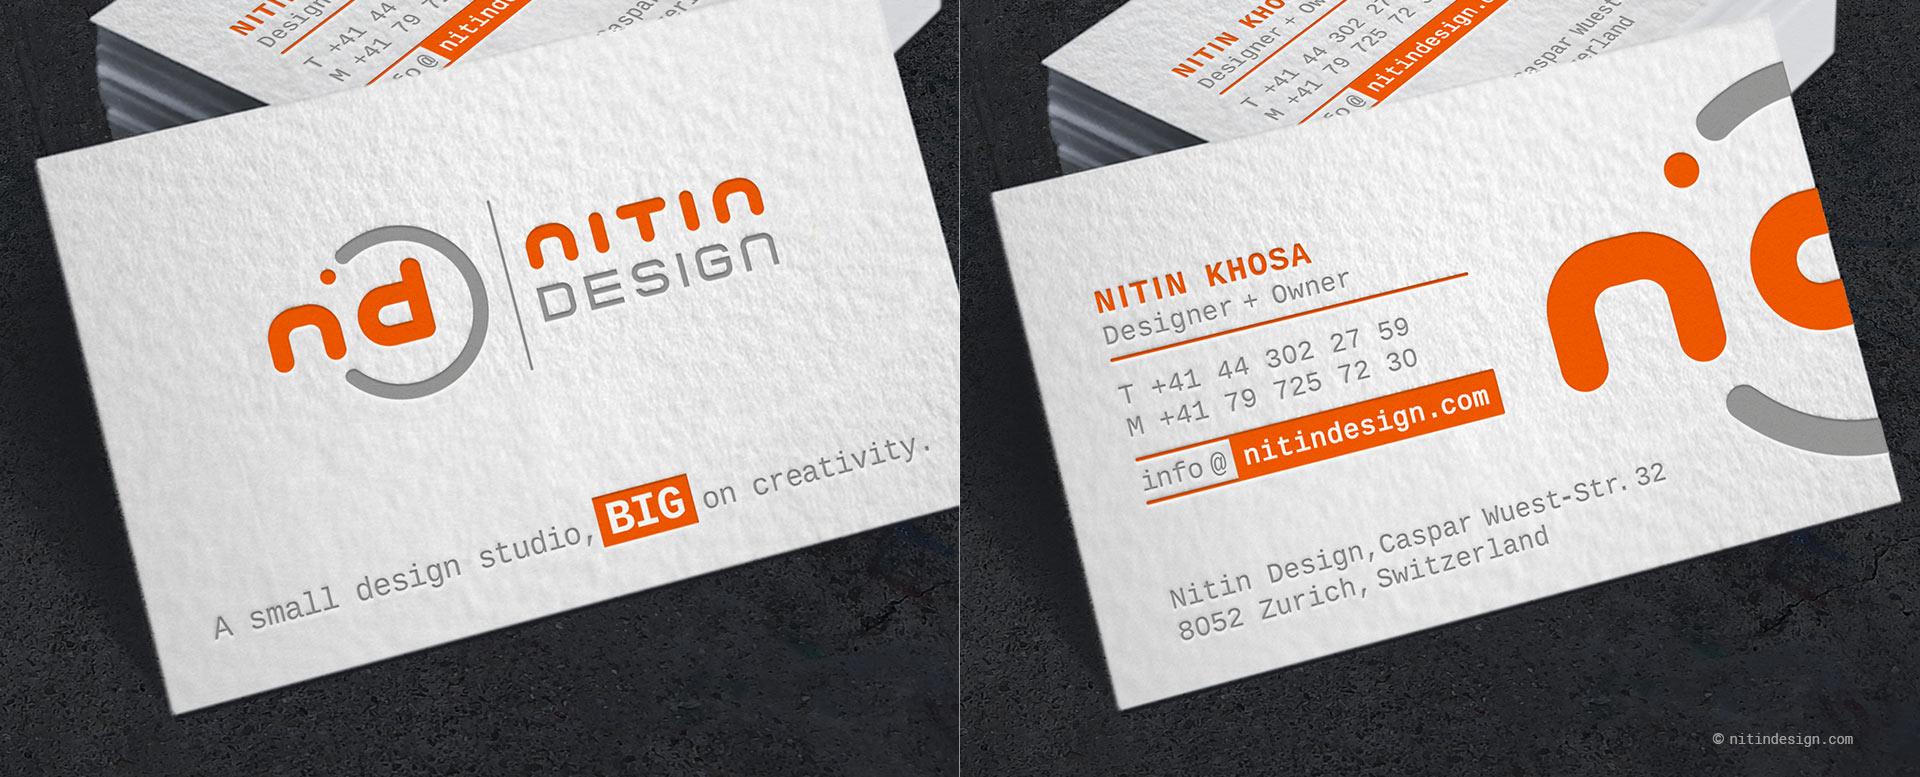 Nitin-Design